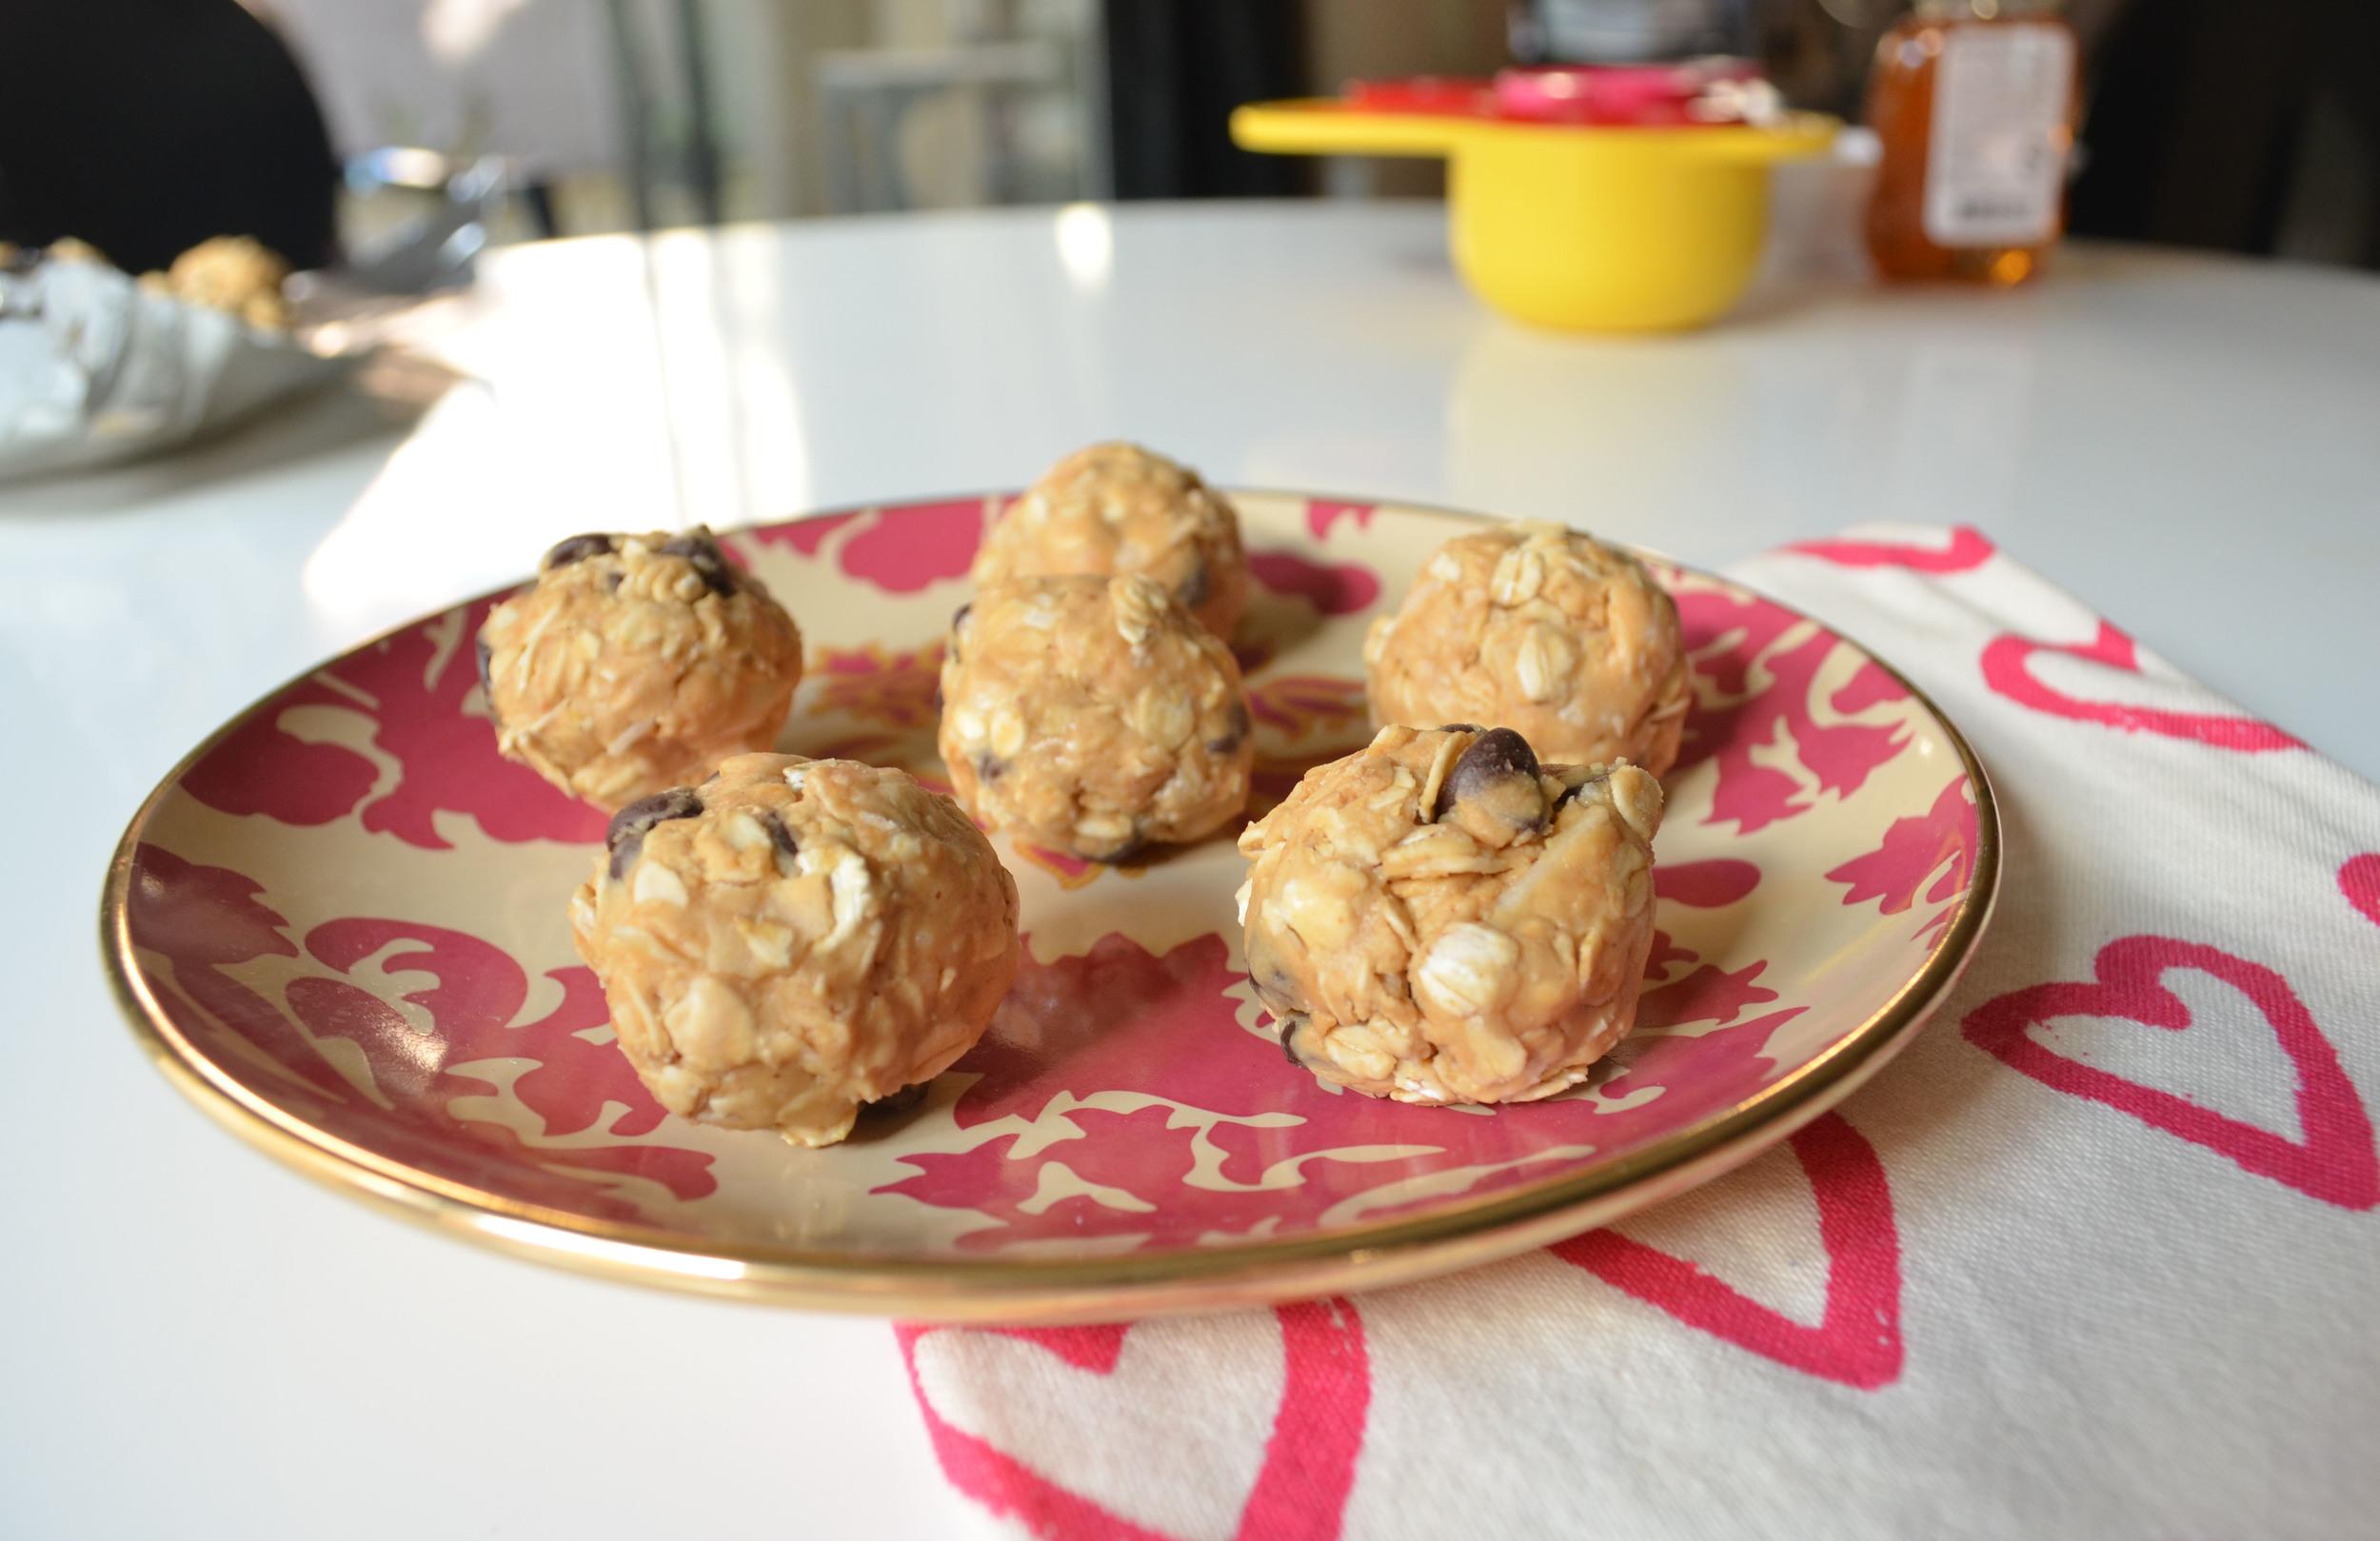 Pregnancy Peanut Butter & Chocolate Protein Balls | Momma Society | www.mommasociety.com